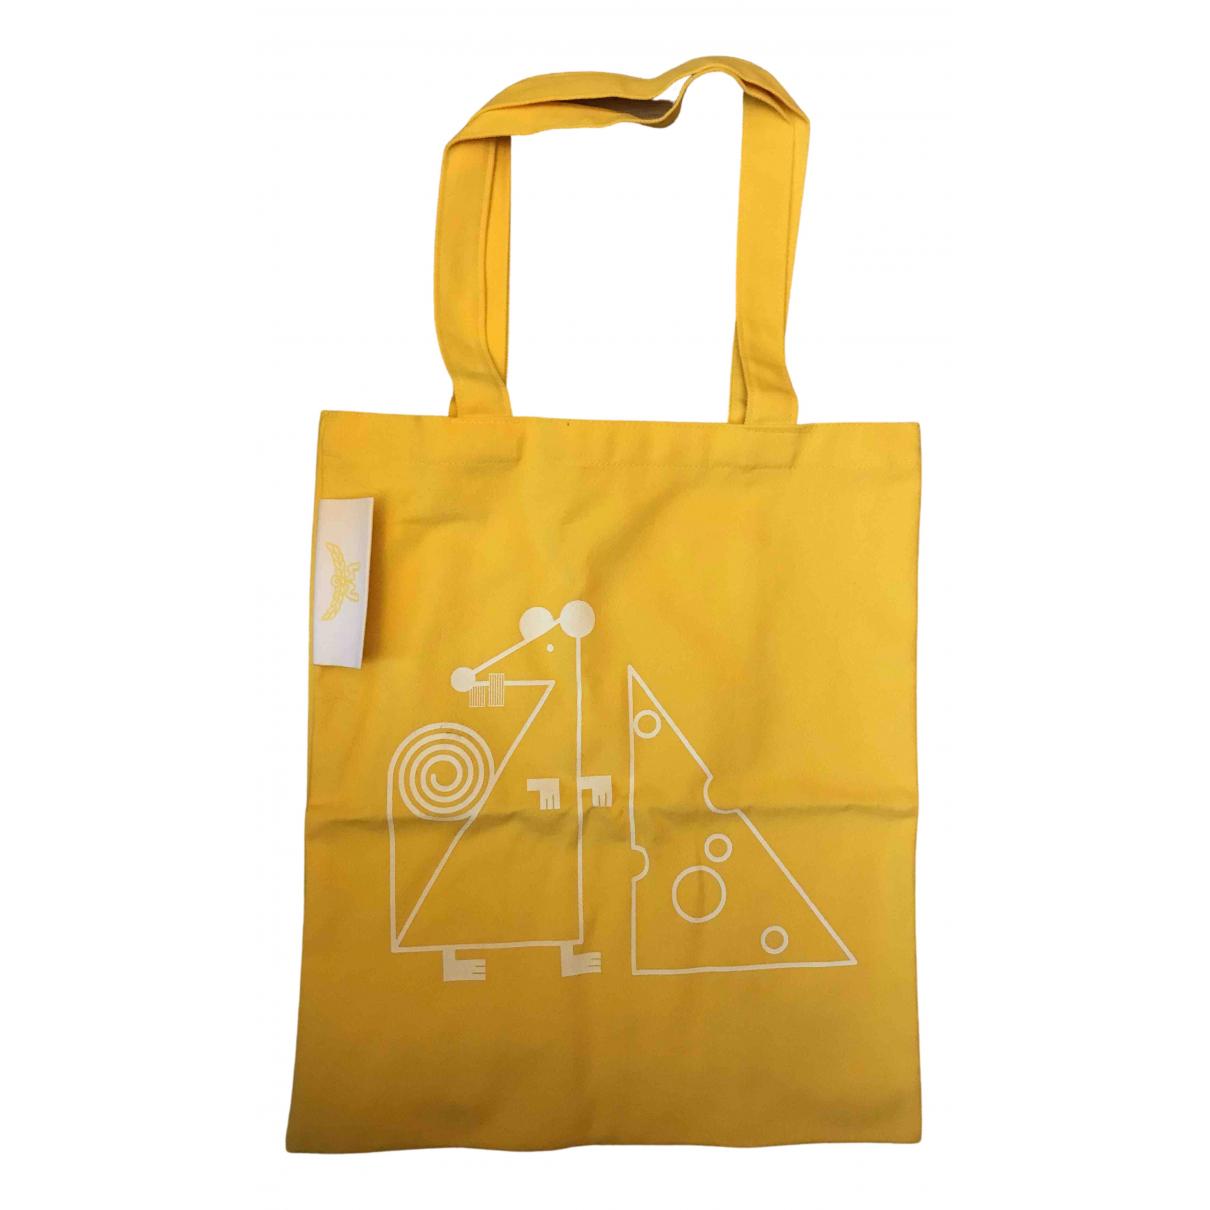 Mcm \N Yellow Cotton handbag for Women \N